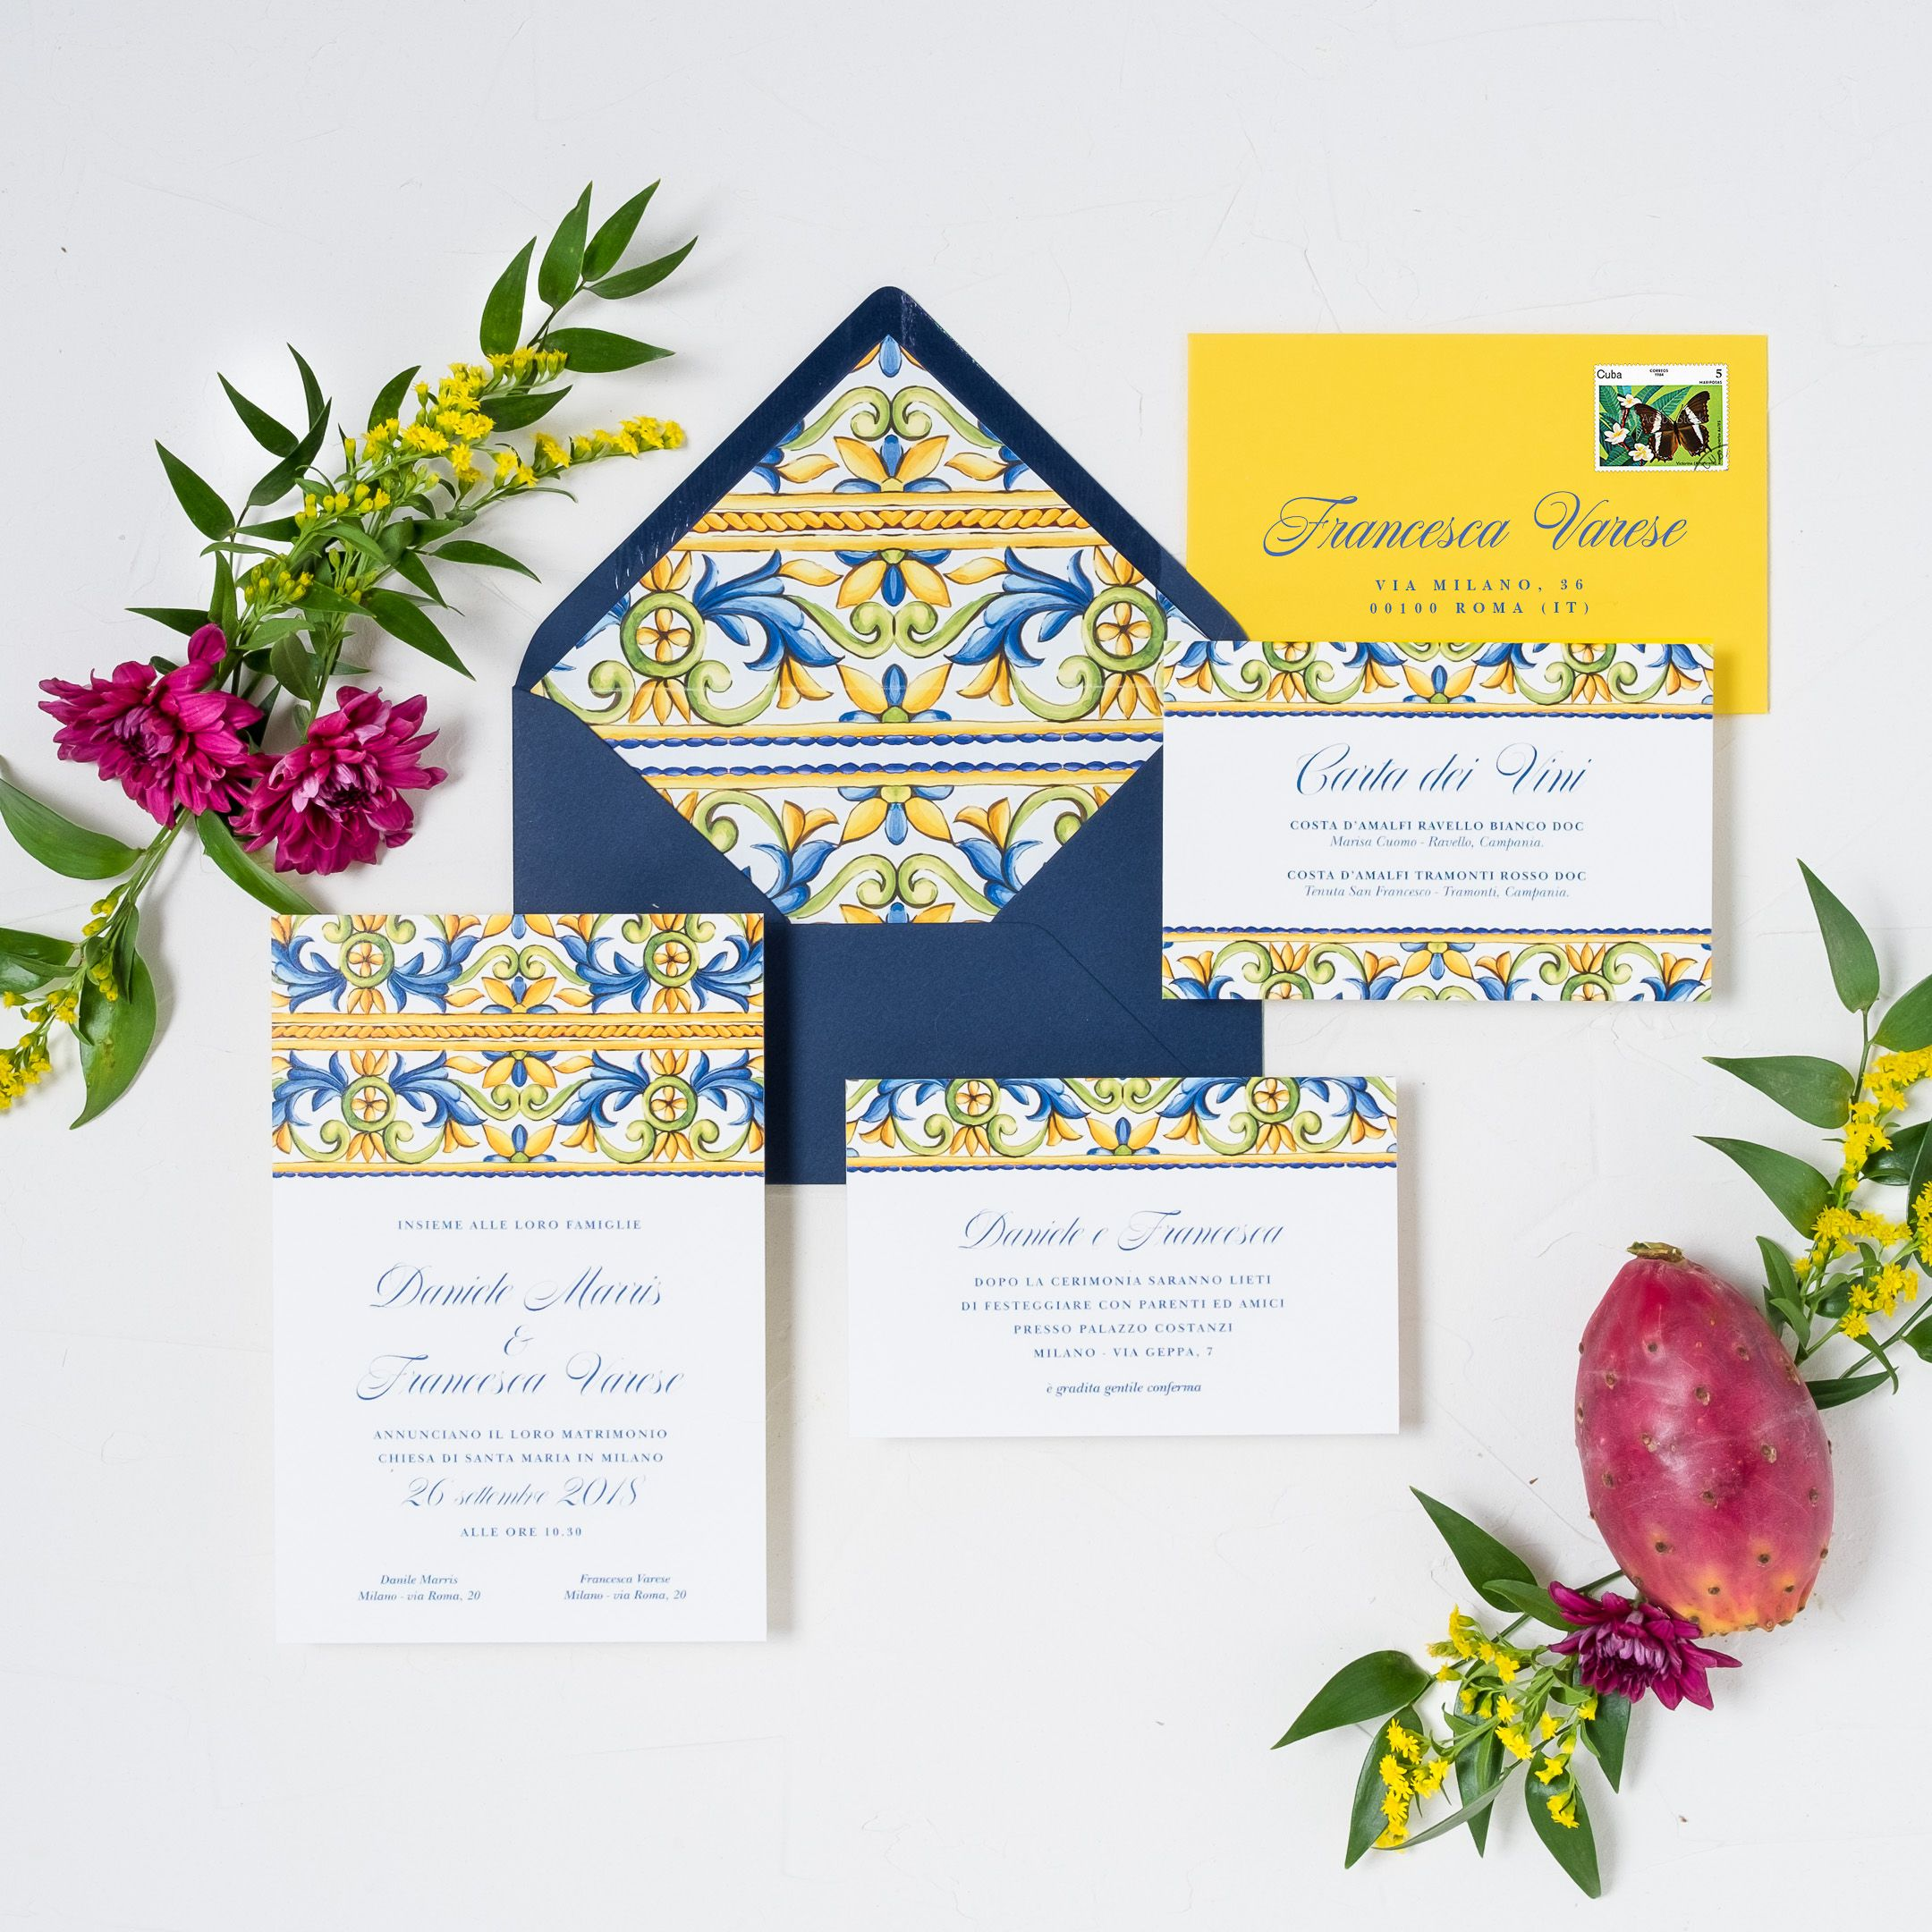 Partecipazioni Matrimonio Maiolica Carta Amalfi Wedding Invitations Majolica Amalfi Paper